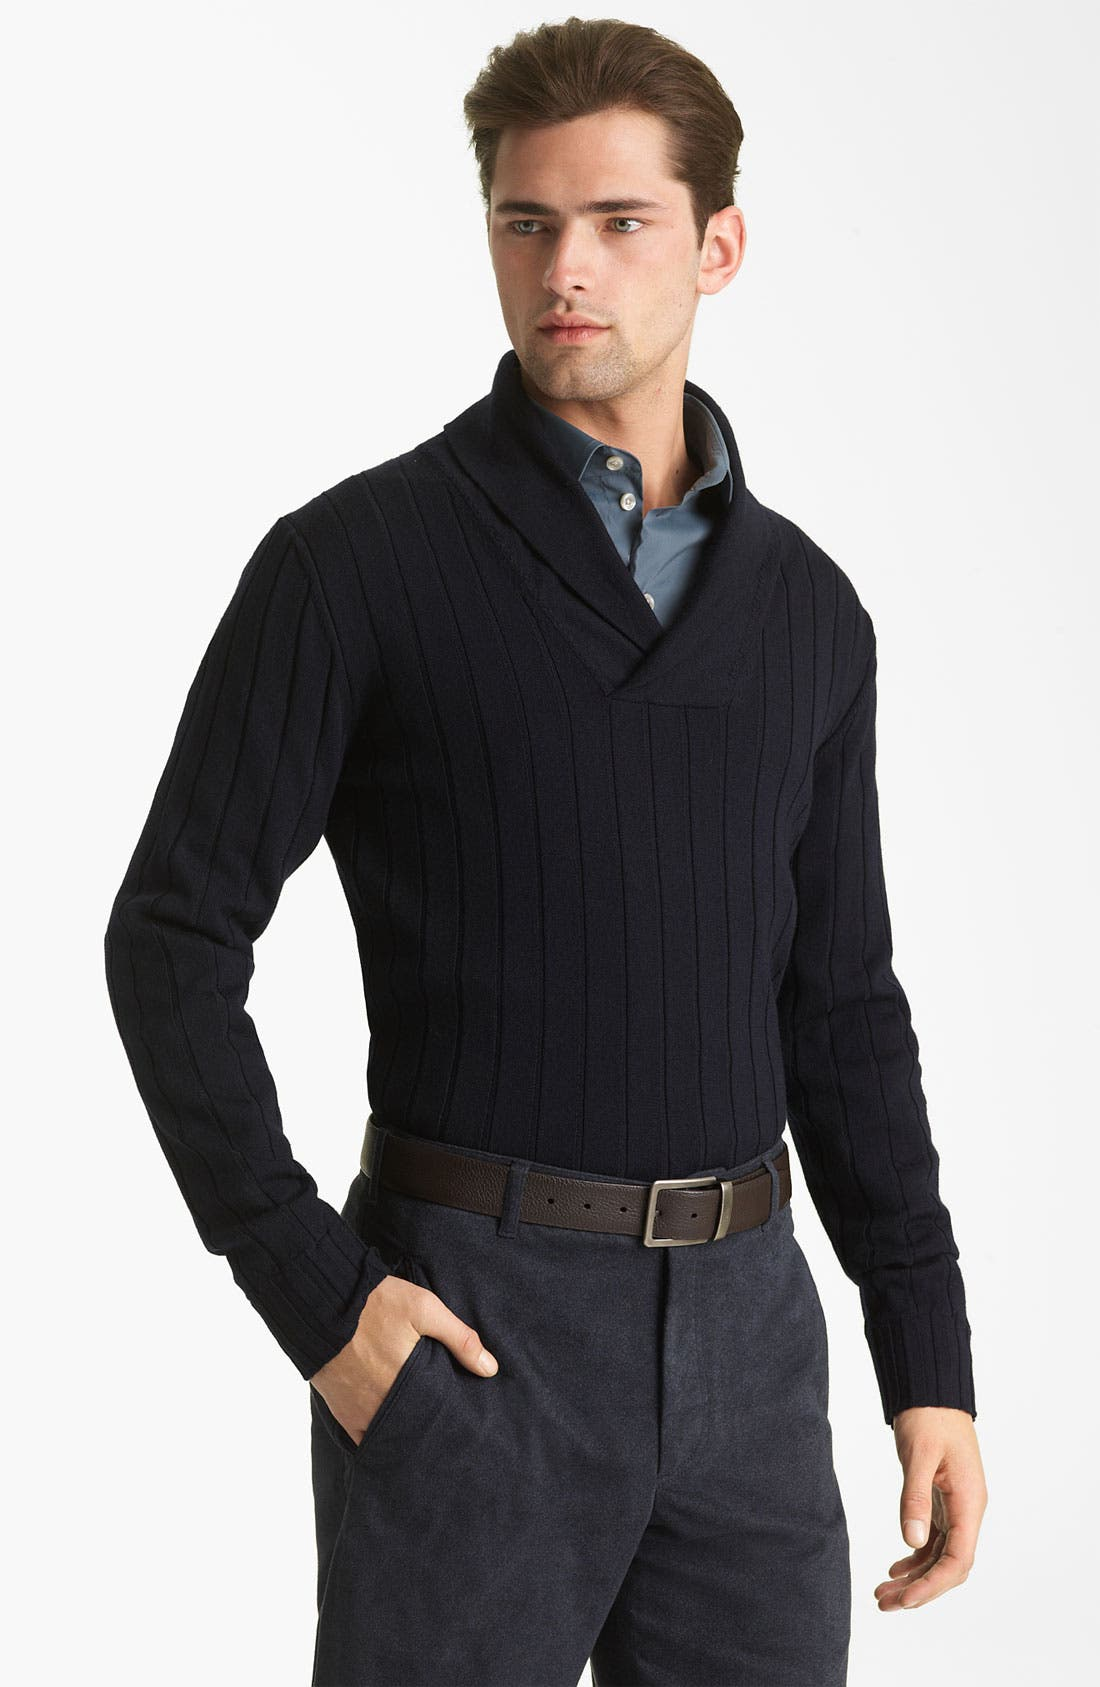 Main Image - Armani Collezioni Wool Shawl Collar Sweater